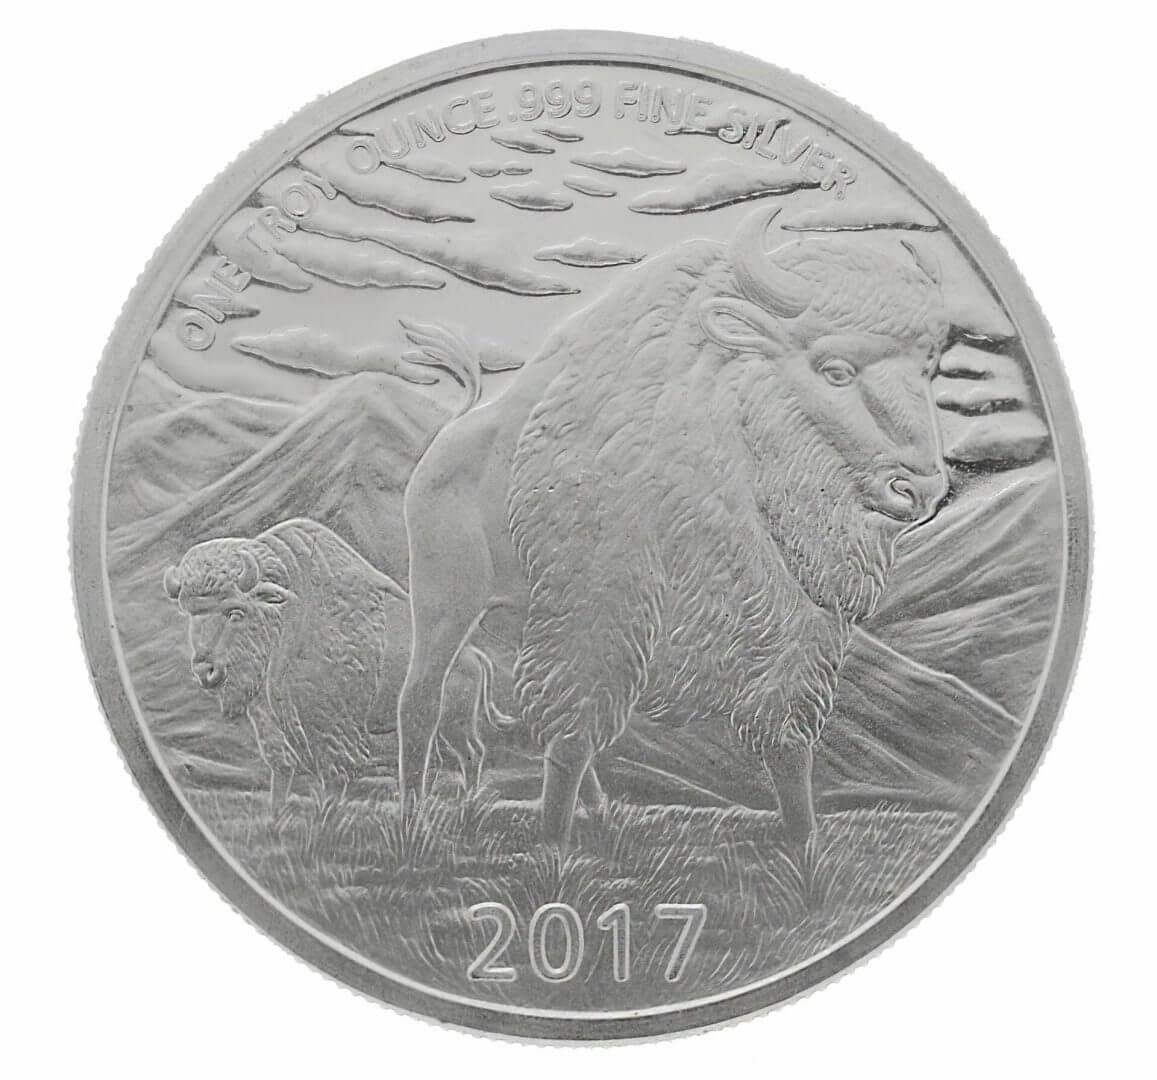 2017 The Hunter 1oz Silver Bullion Coin 3